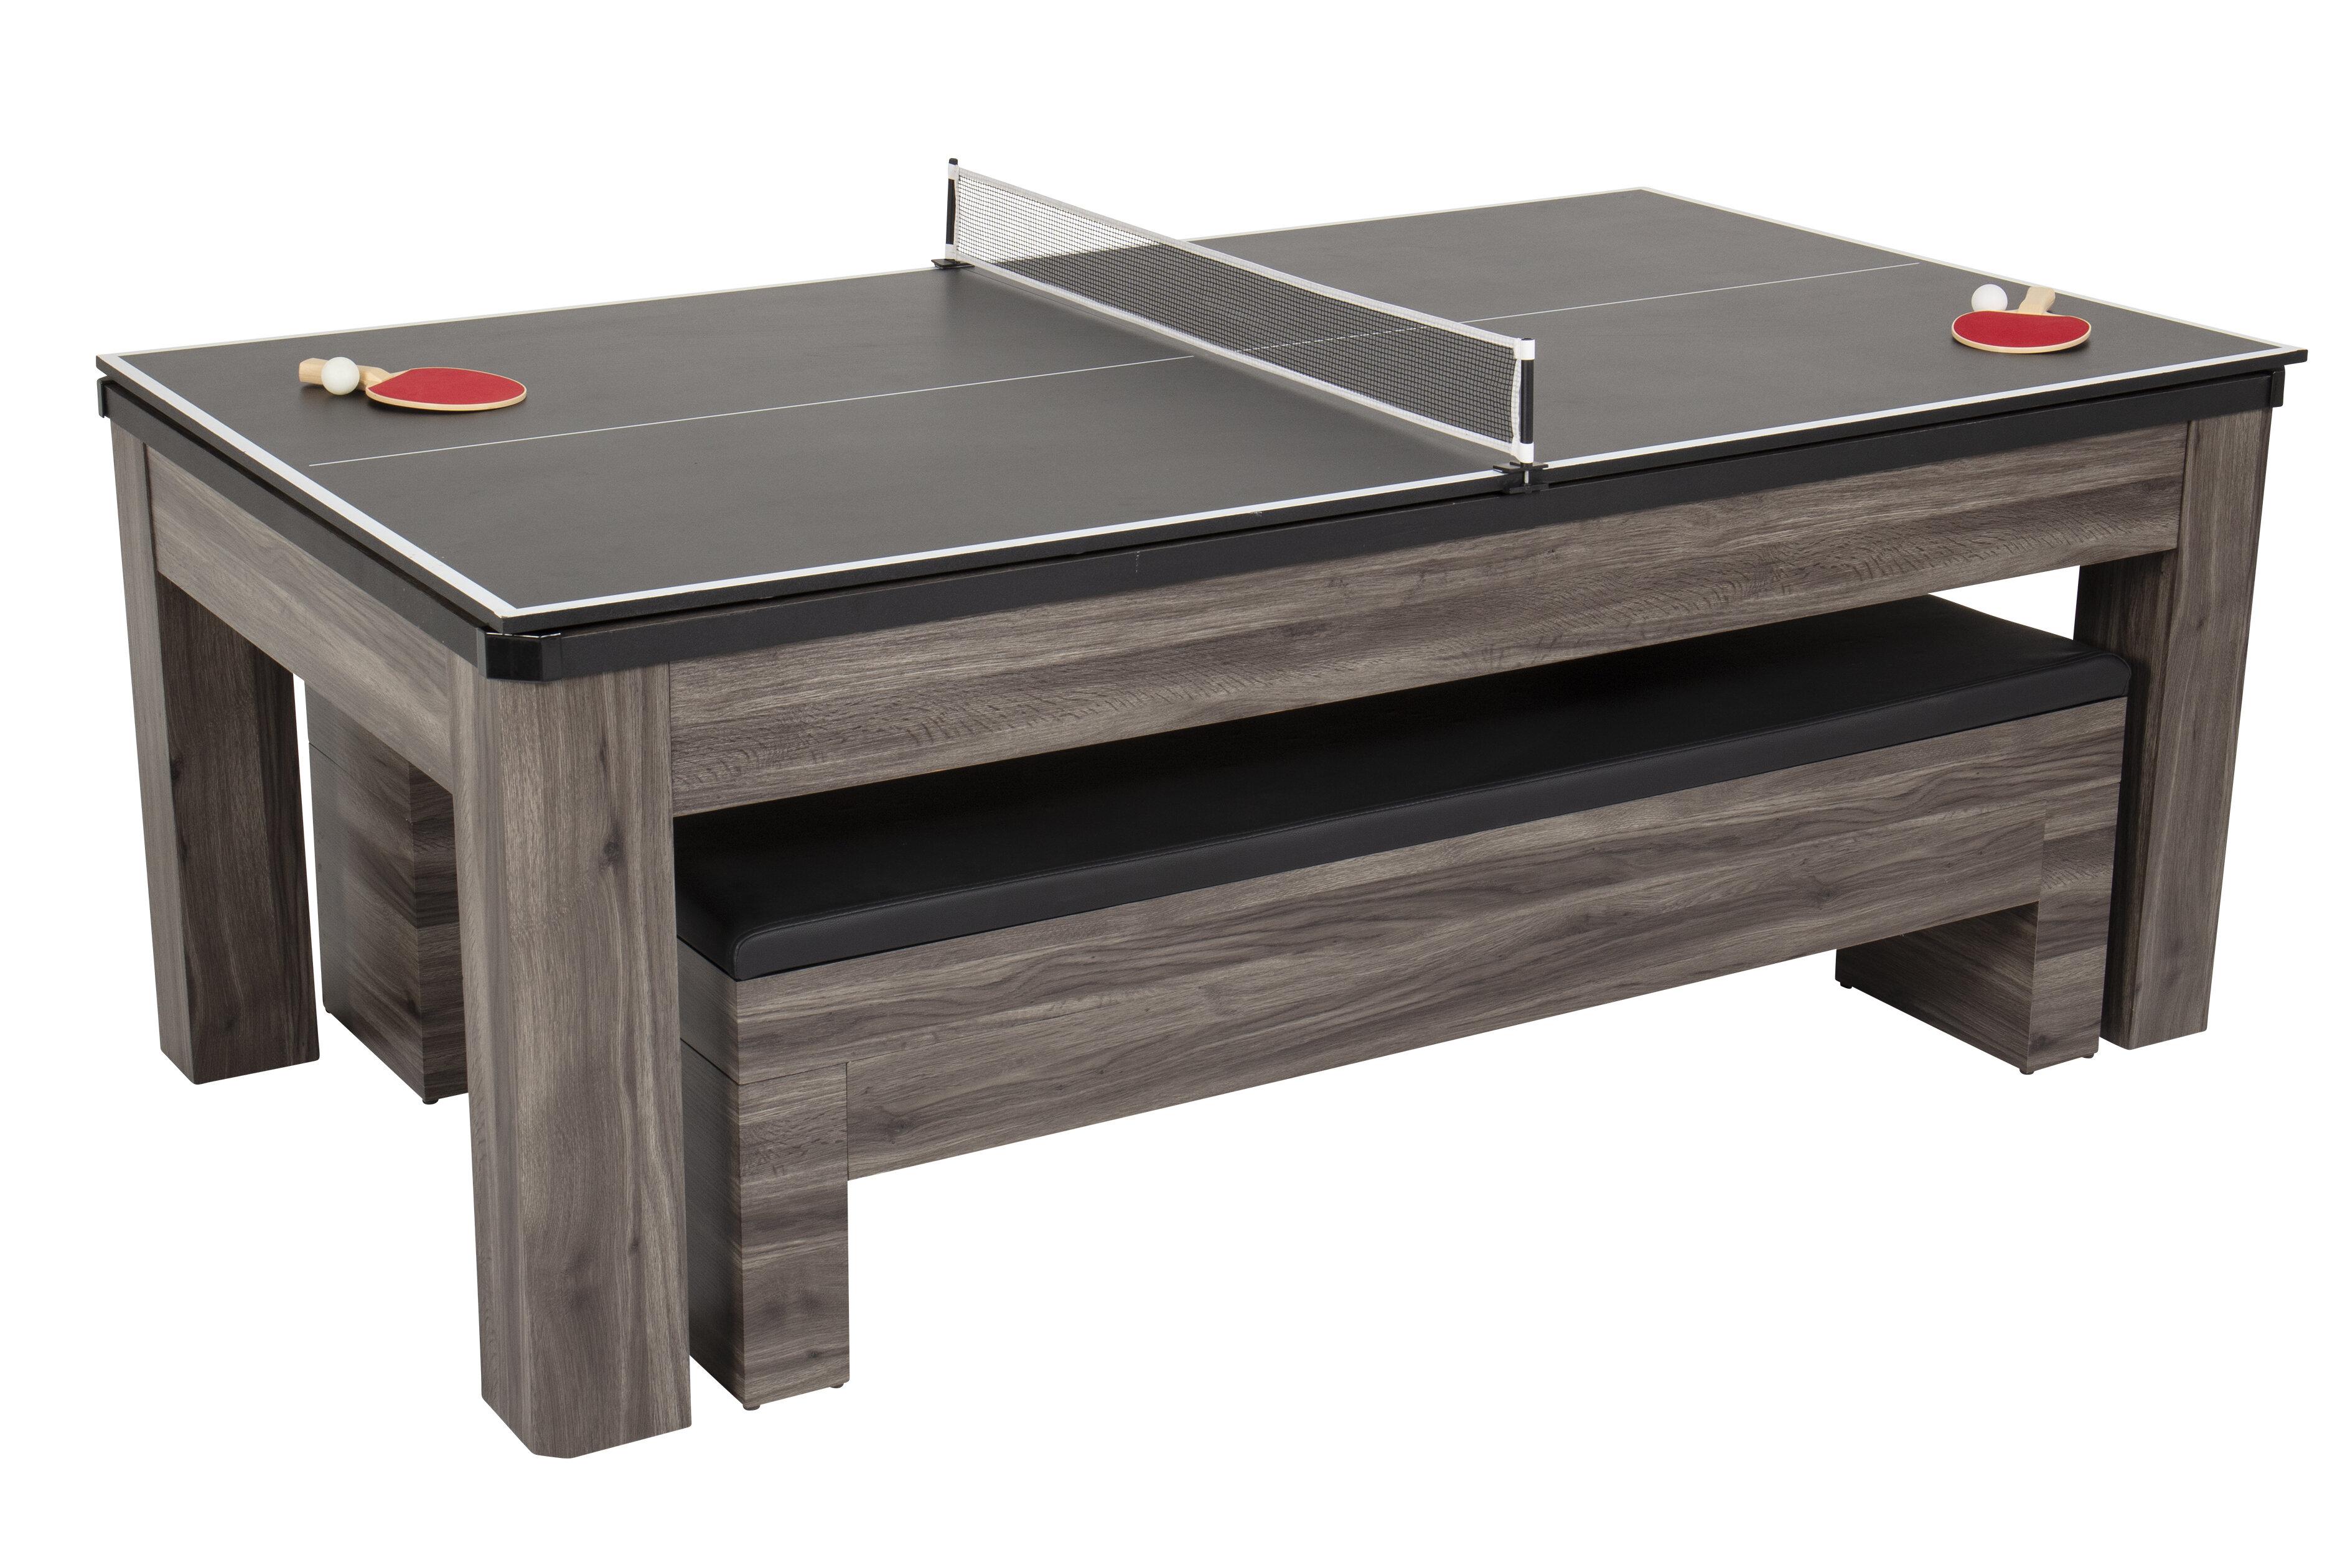 Atomic Hampton 7 3 In 1 Pool Dining And Table Tennis Table Reviews Wayfair